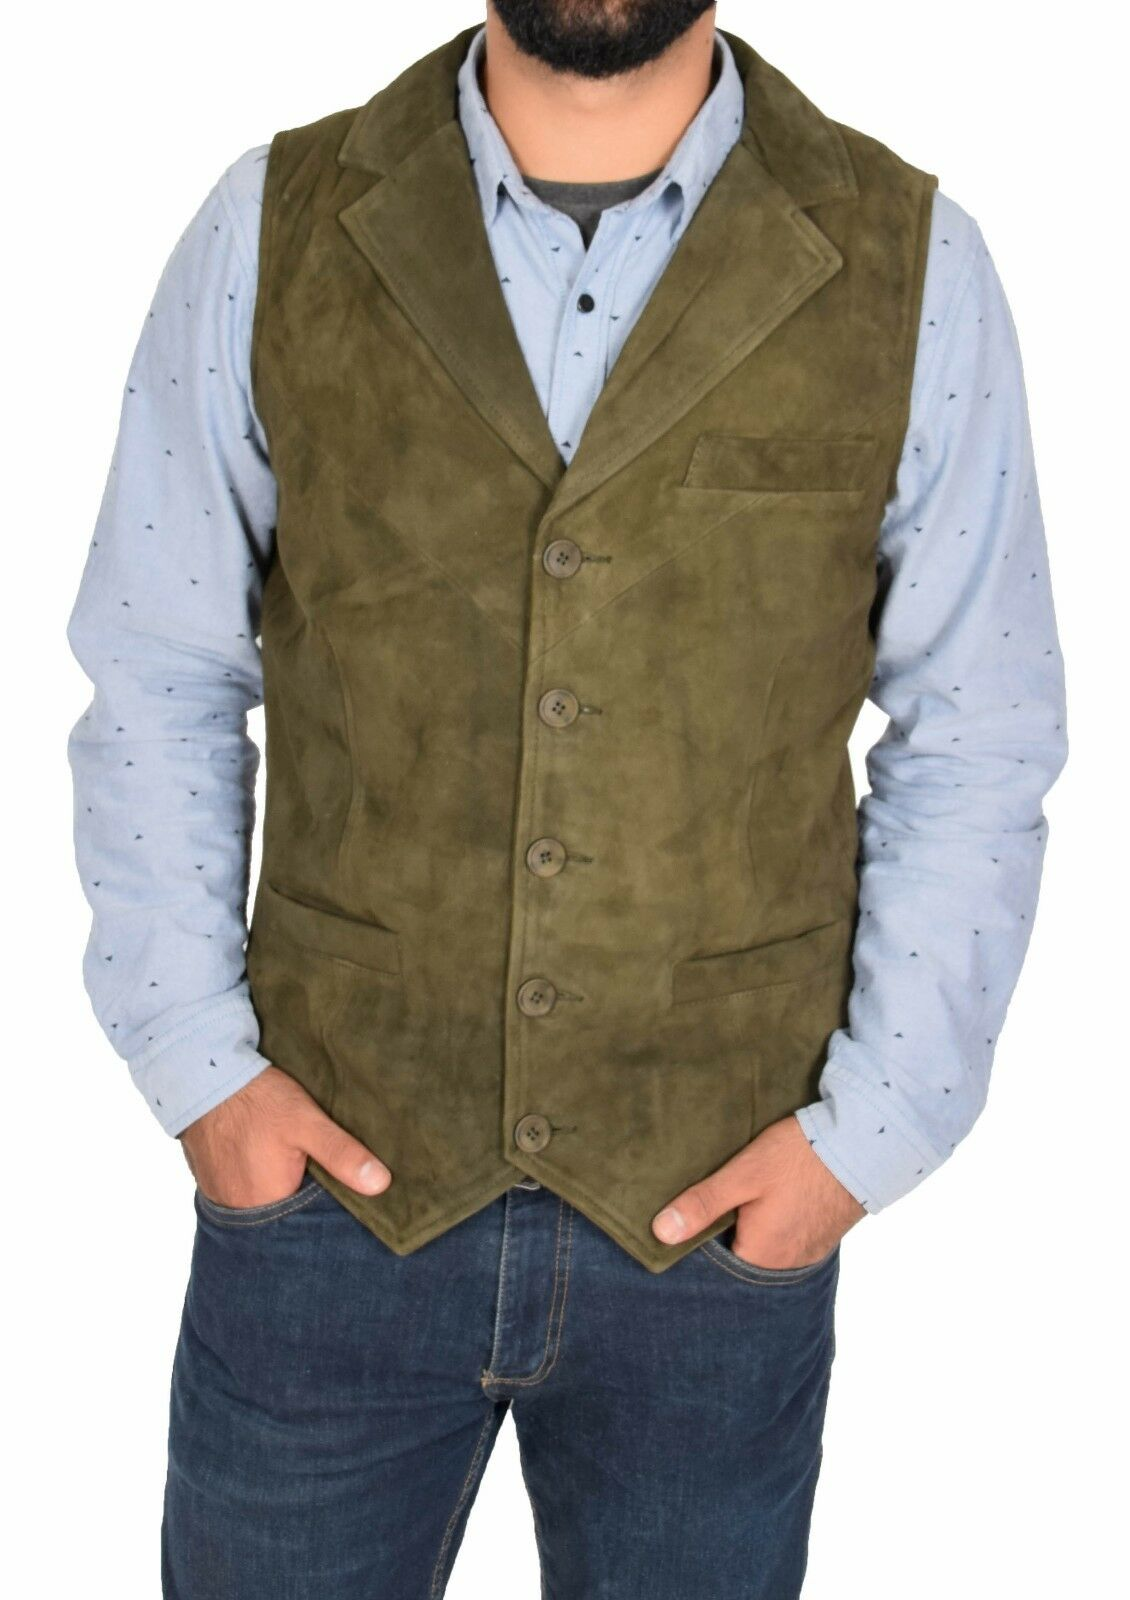 herren Lightweight Real Suede Traditional Style Classic Waistcoat Gilet Vest Grün